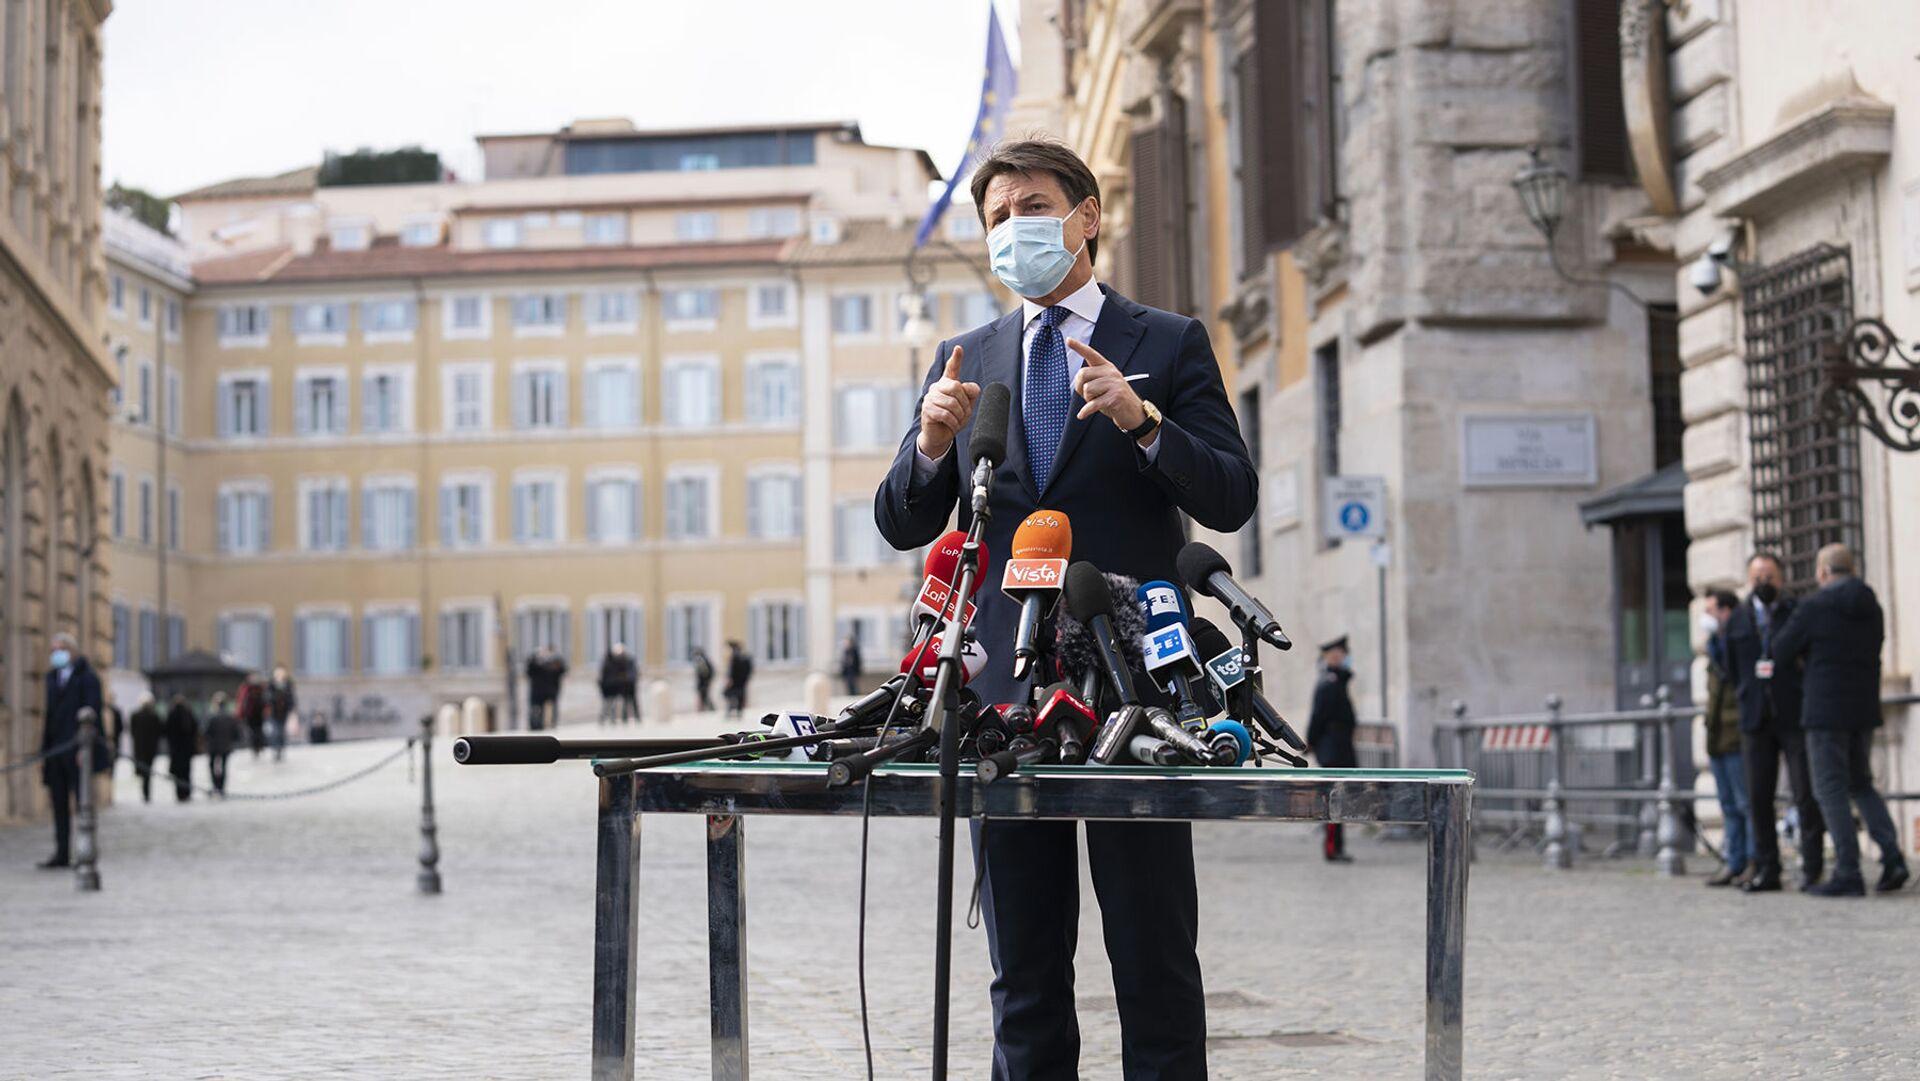 Giuseppe Conte incontra la stampa  - Sputnik Italia, 1920, 02.07.2021